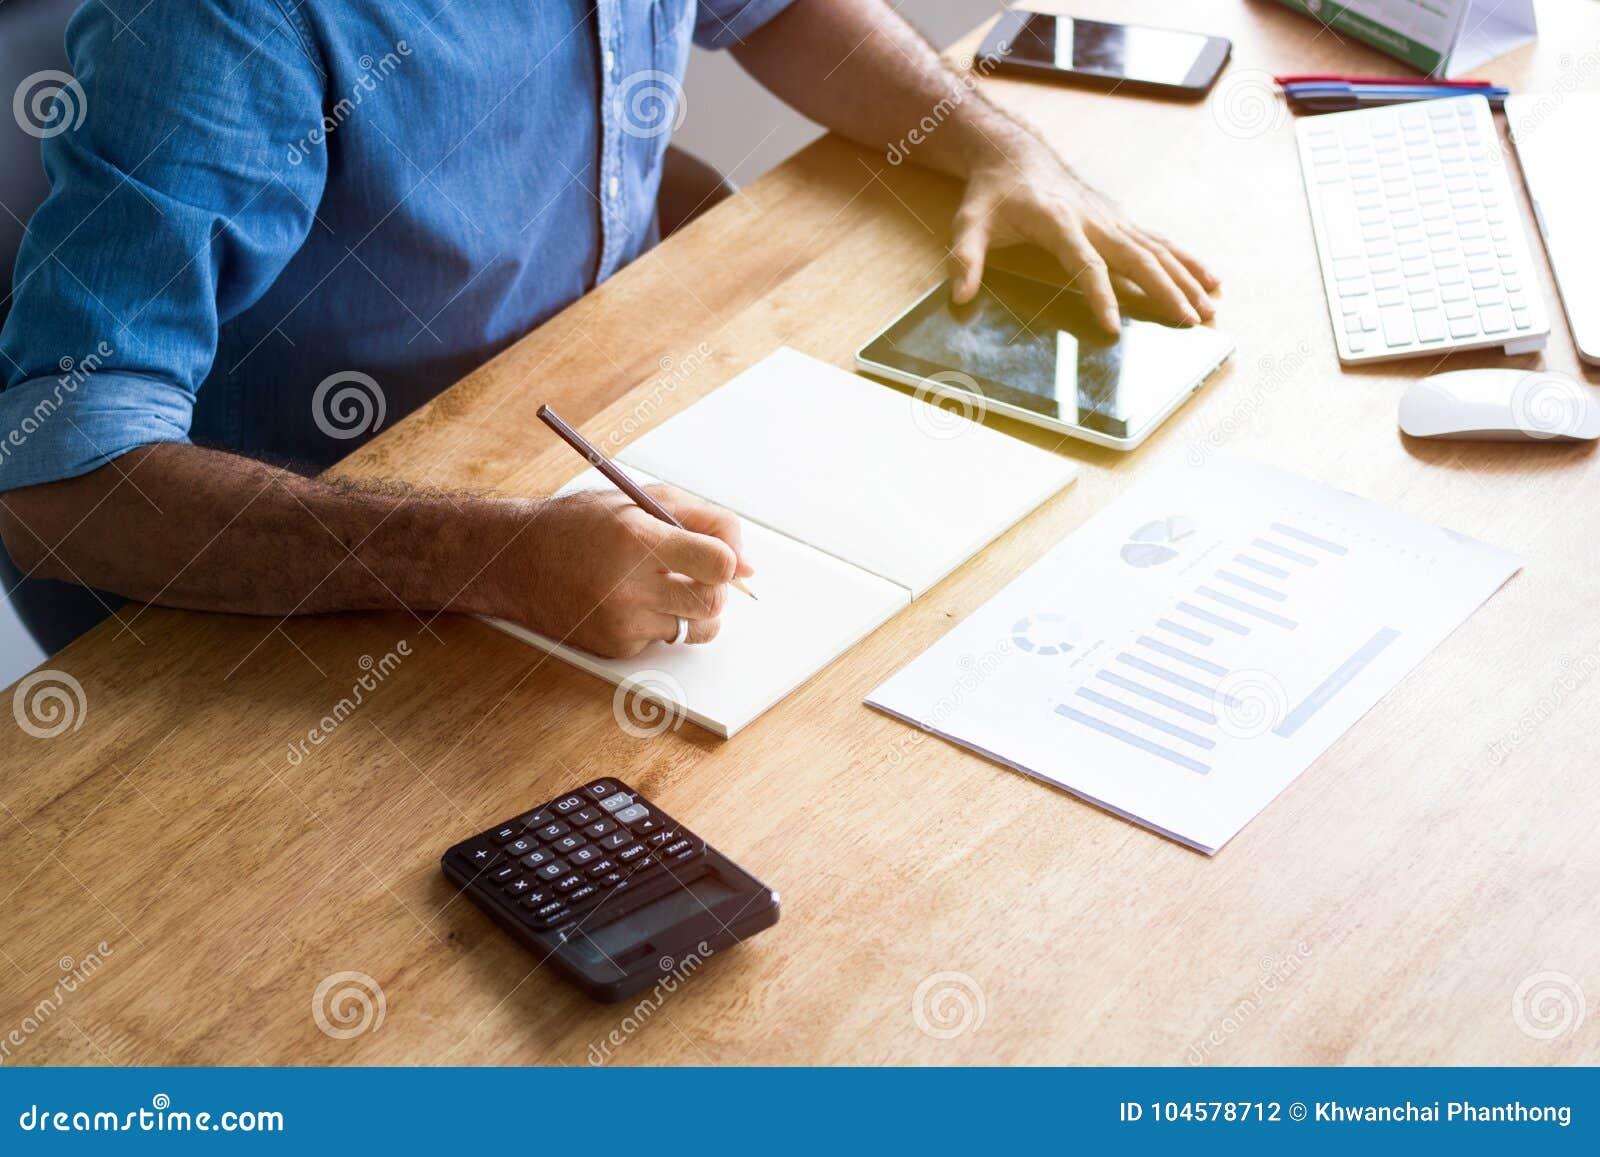 Calcule o conceito do orçamento e do planeamento empresarial, pessoa que couting r